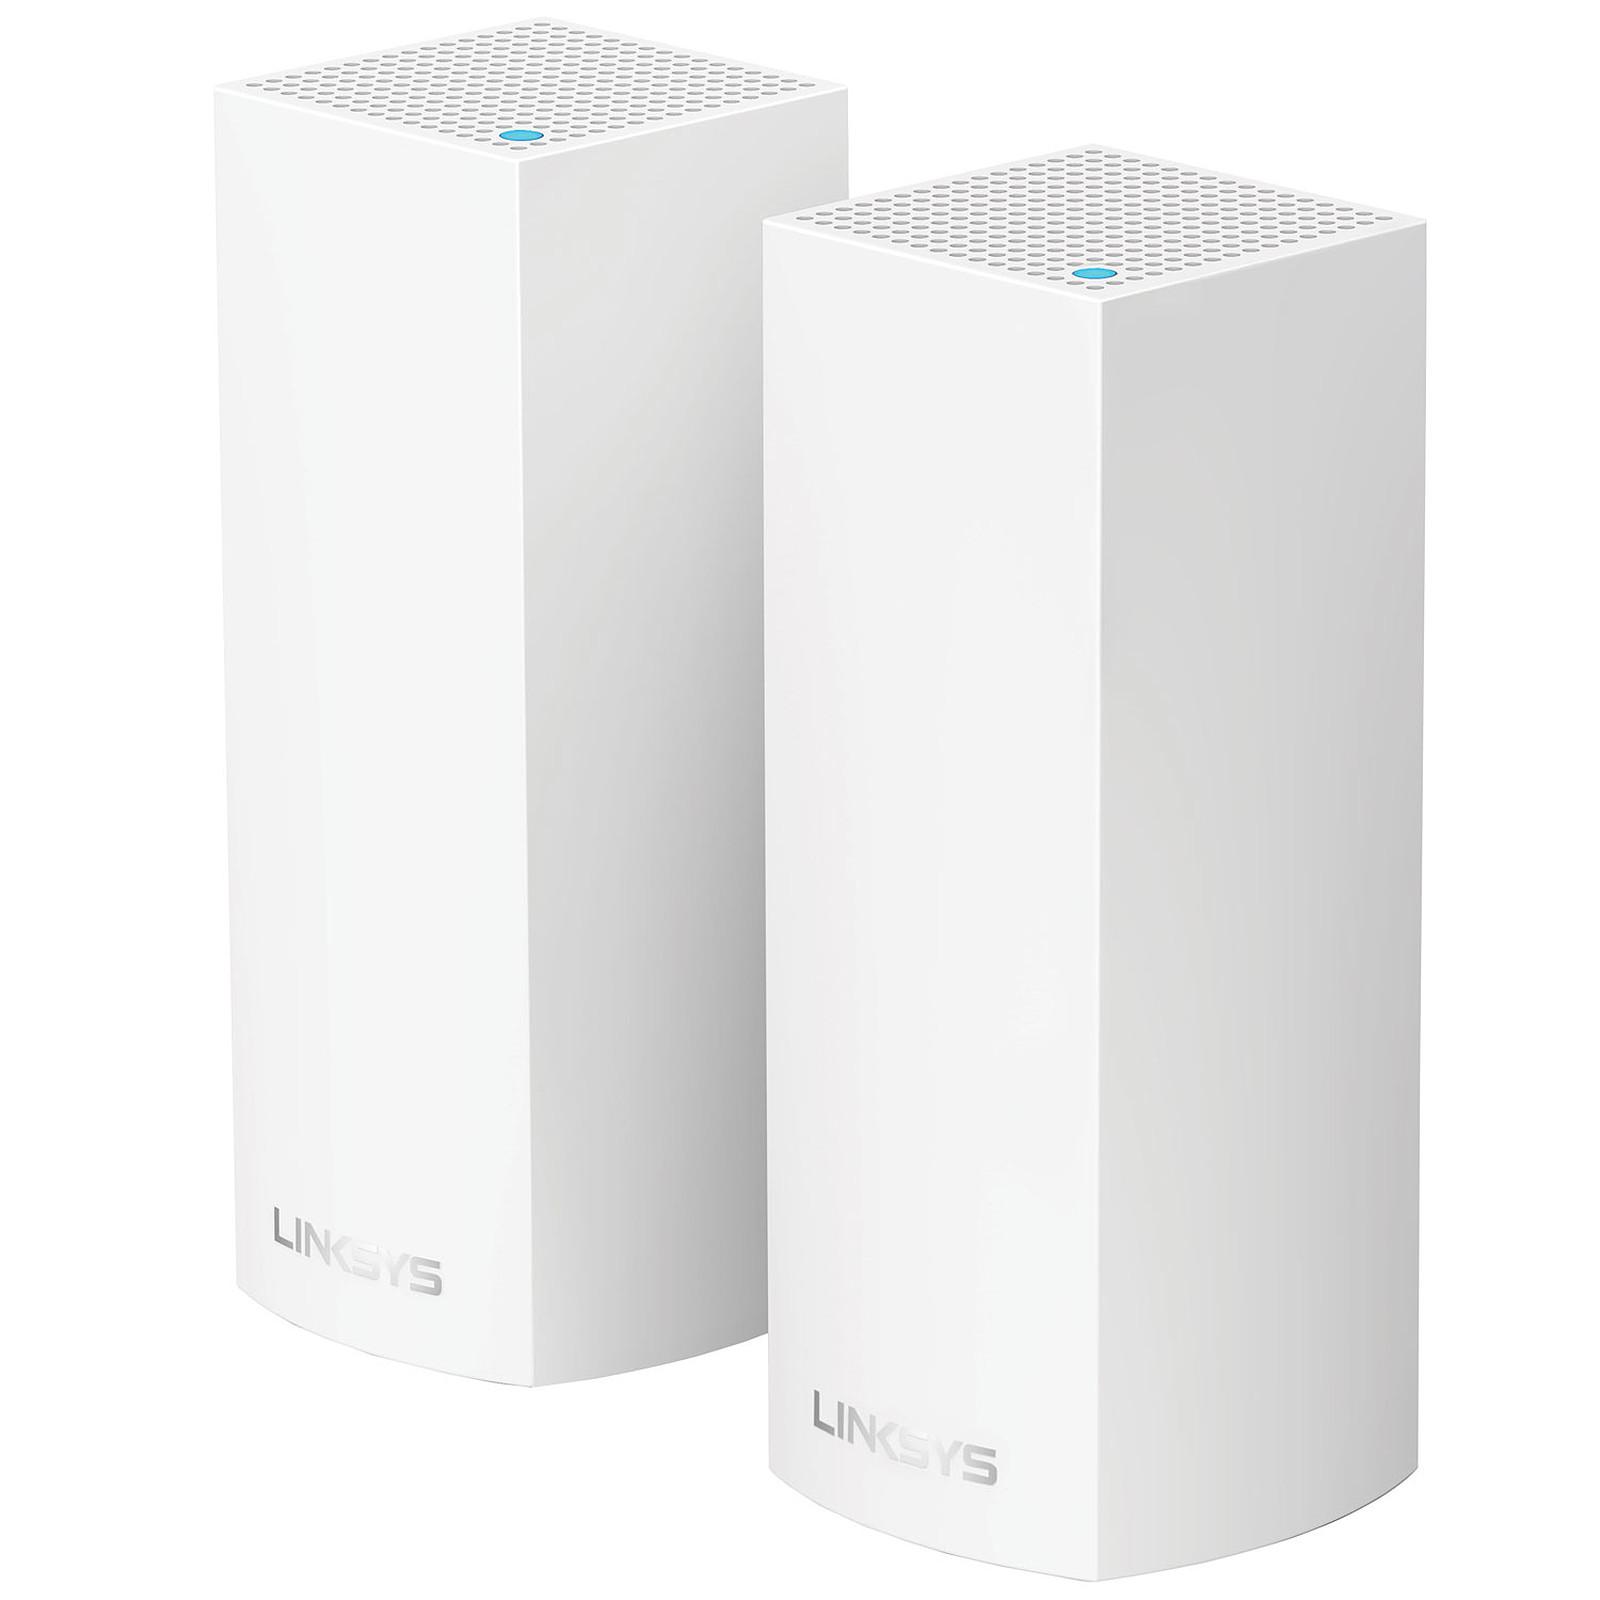 Linksys Velop Système Wi-Fi Multi-room (Pack de 2)